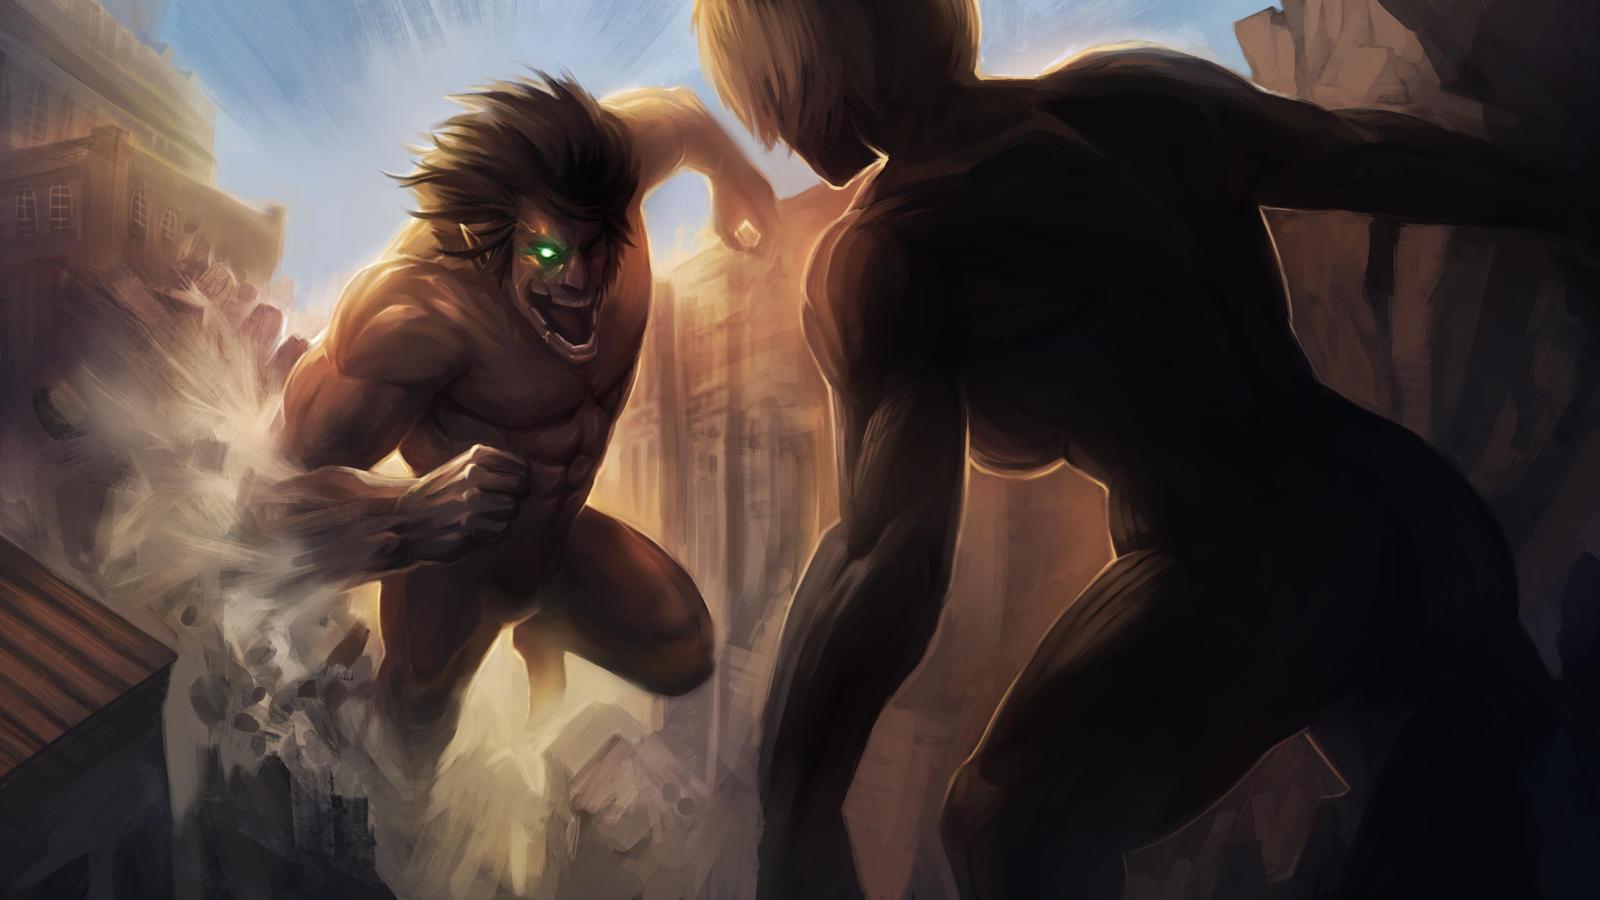 Attack on Titan - Eren vs Annie by MoshYong